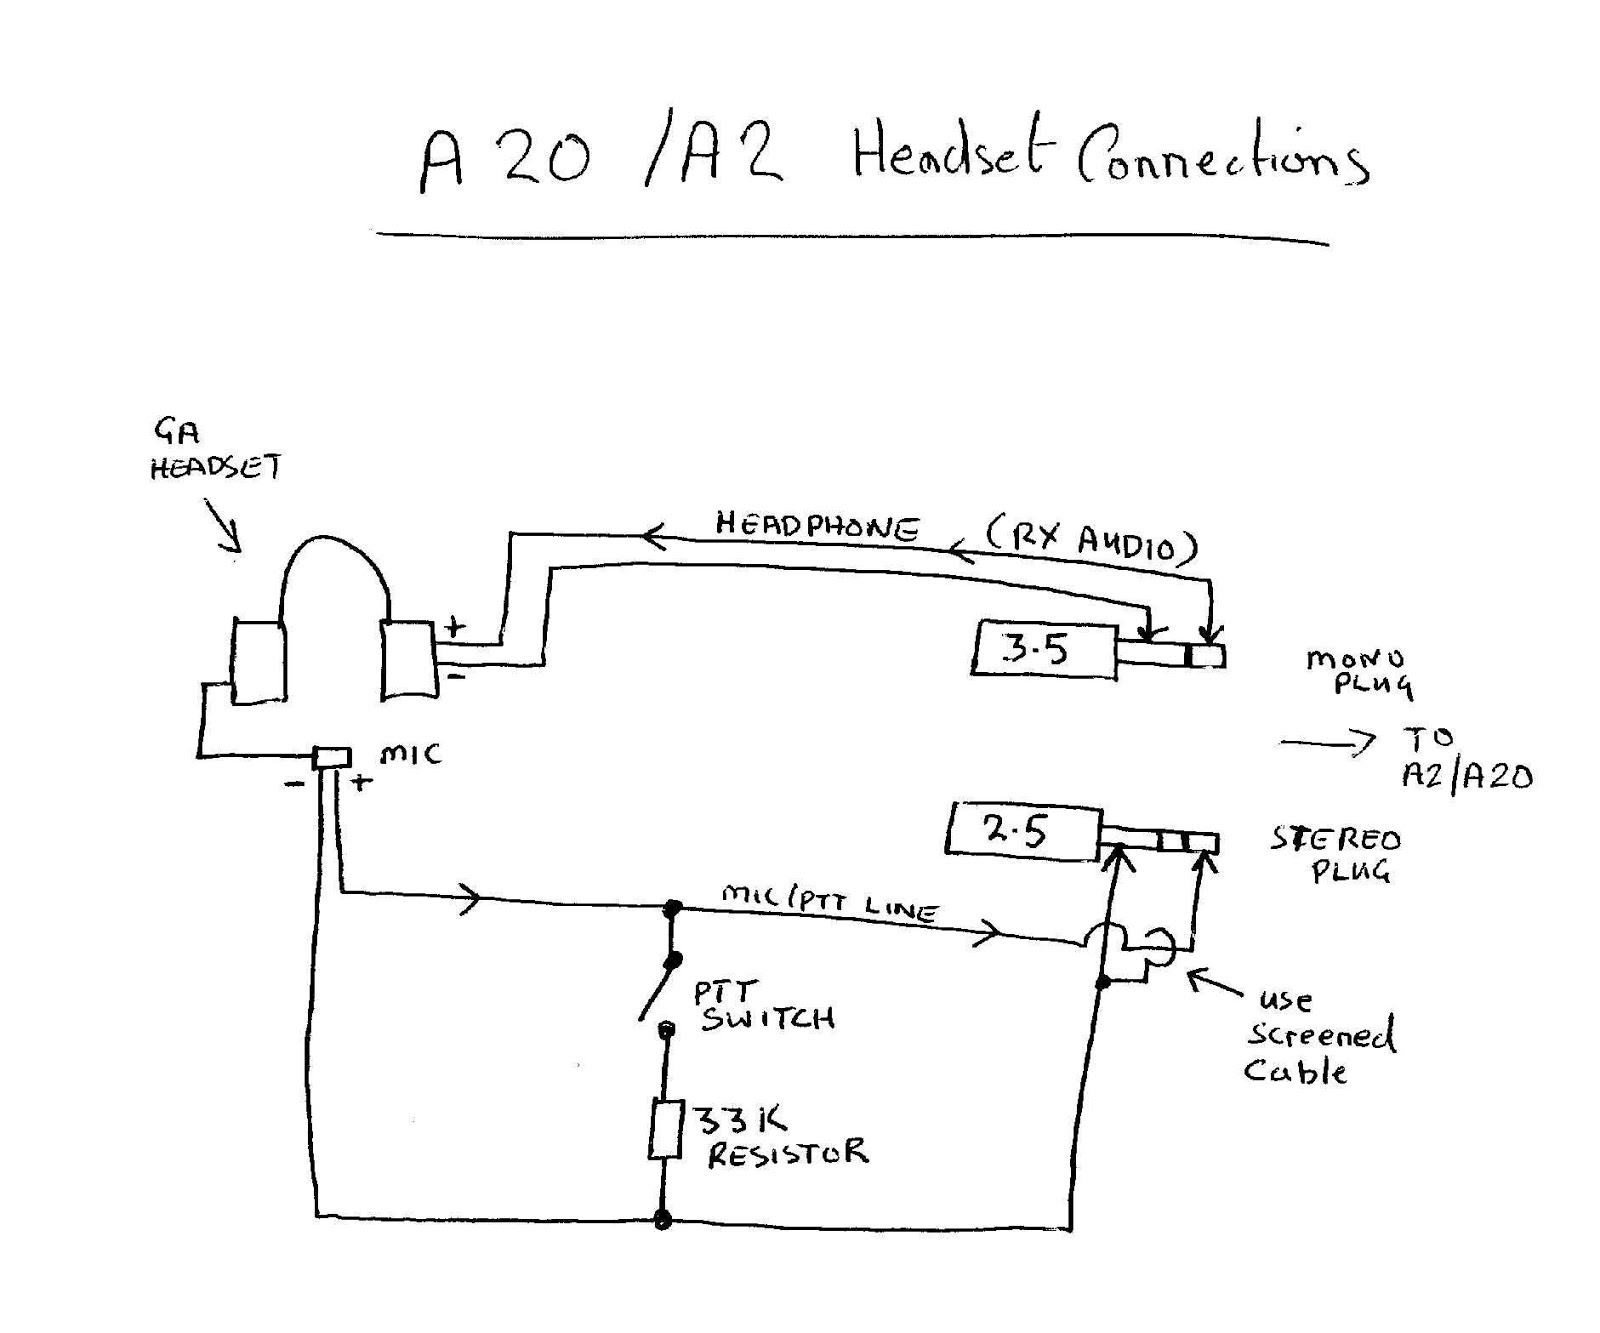 Icom Computer Headset Wiring Diagram -Motorola Speaker Mic Wiring Diagrams  | Begeboy Wiring Diagram Source | Motorola Speaker Mic Wiring Diagrams |  | Begeboy Wiring Diagram Source